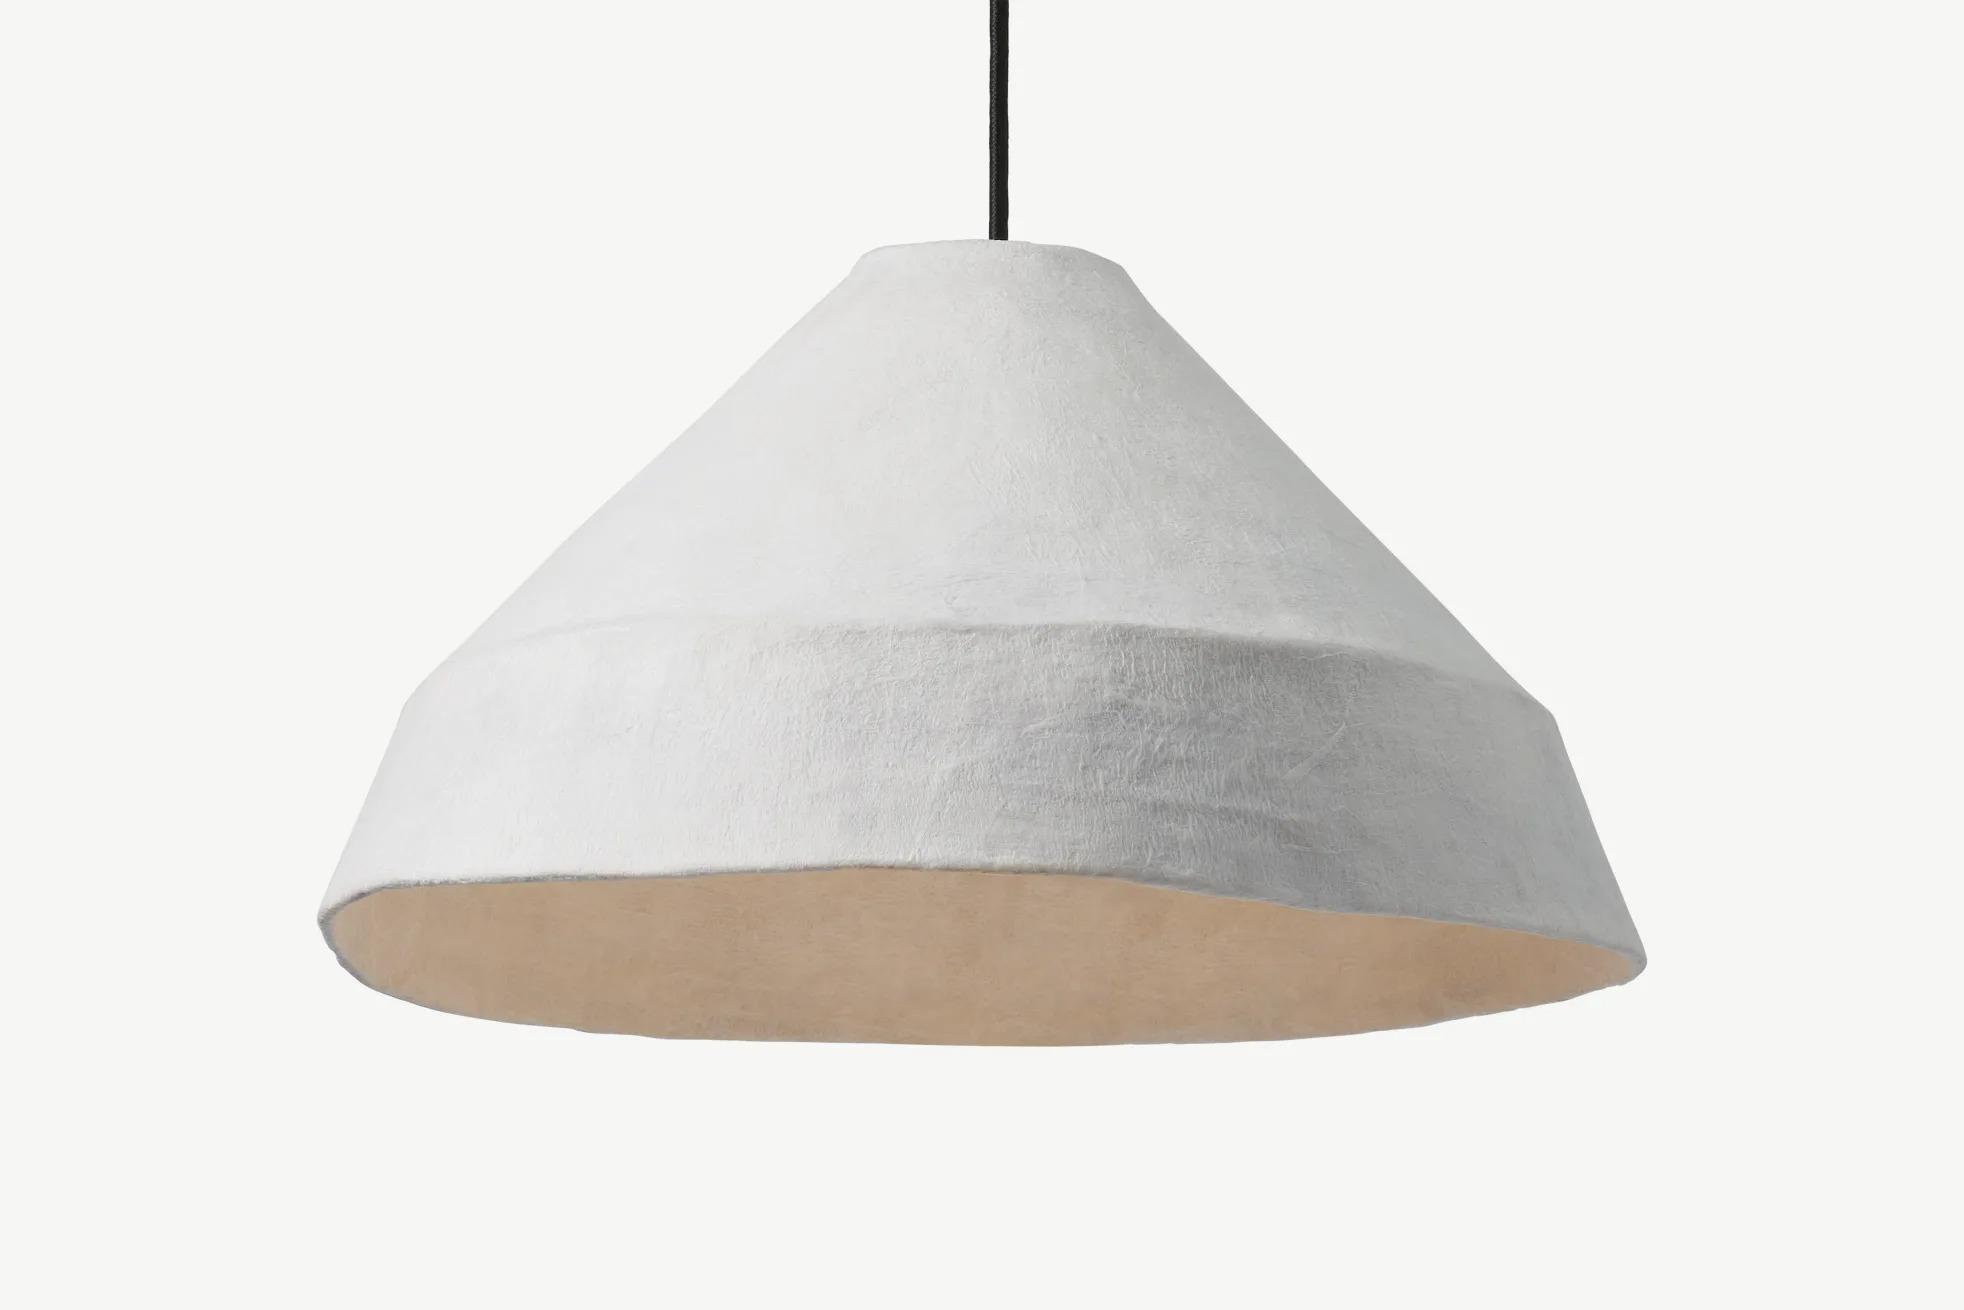 Pantalla de lámpara Dahlia, papel maché blanco